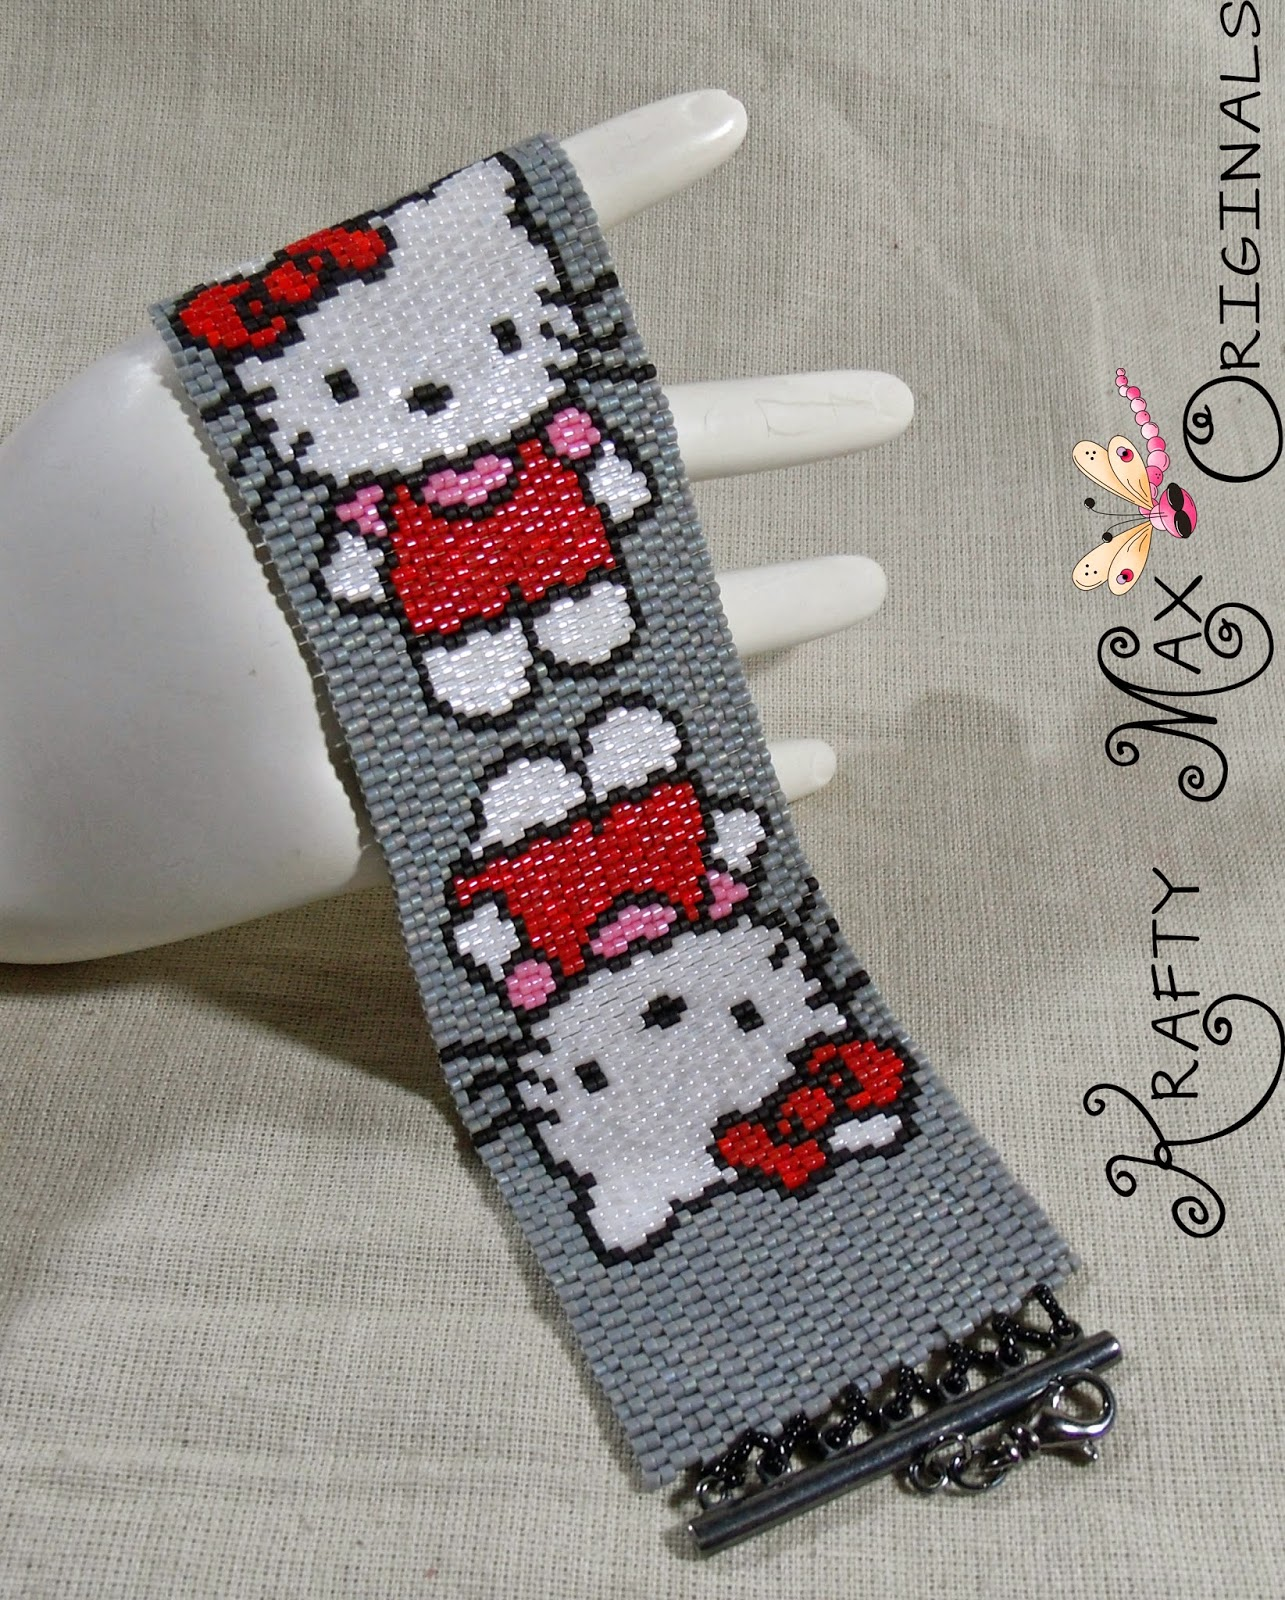 http://www.artfire.com/ext/shop/product_view/9510702